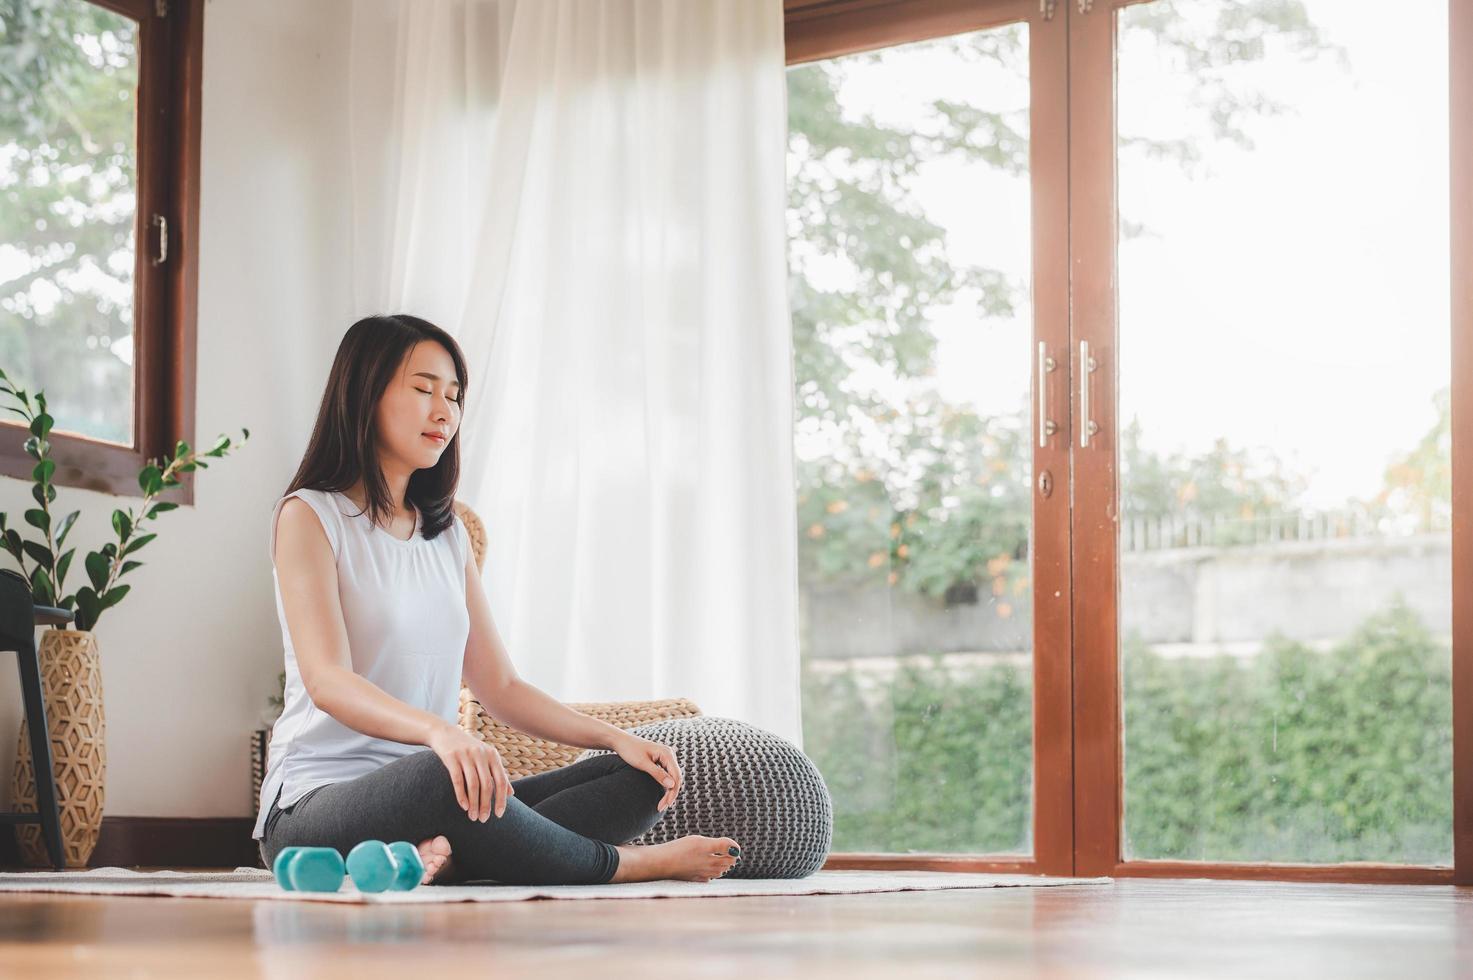 Asian woman doing yoga meditation 1264121 Stock Photo at Vecteezy